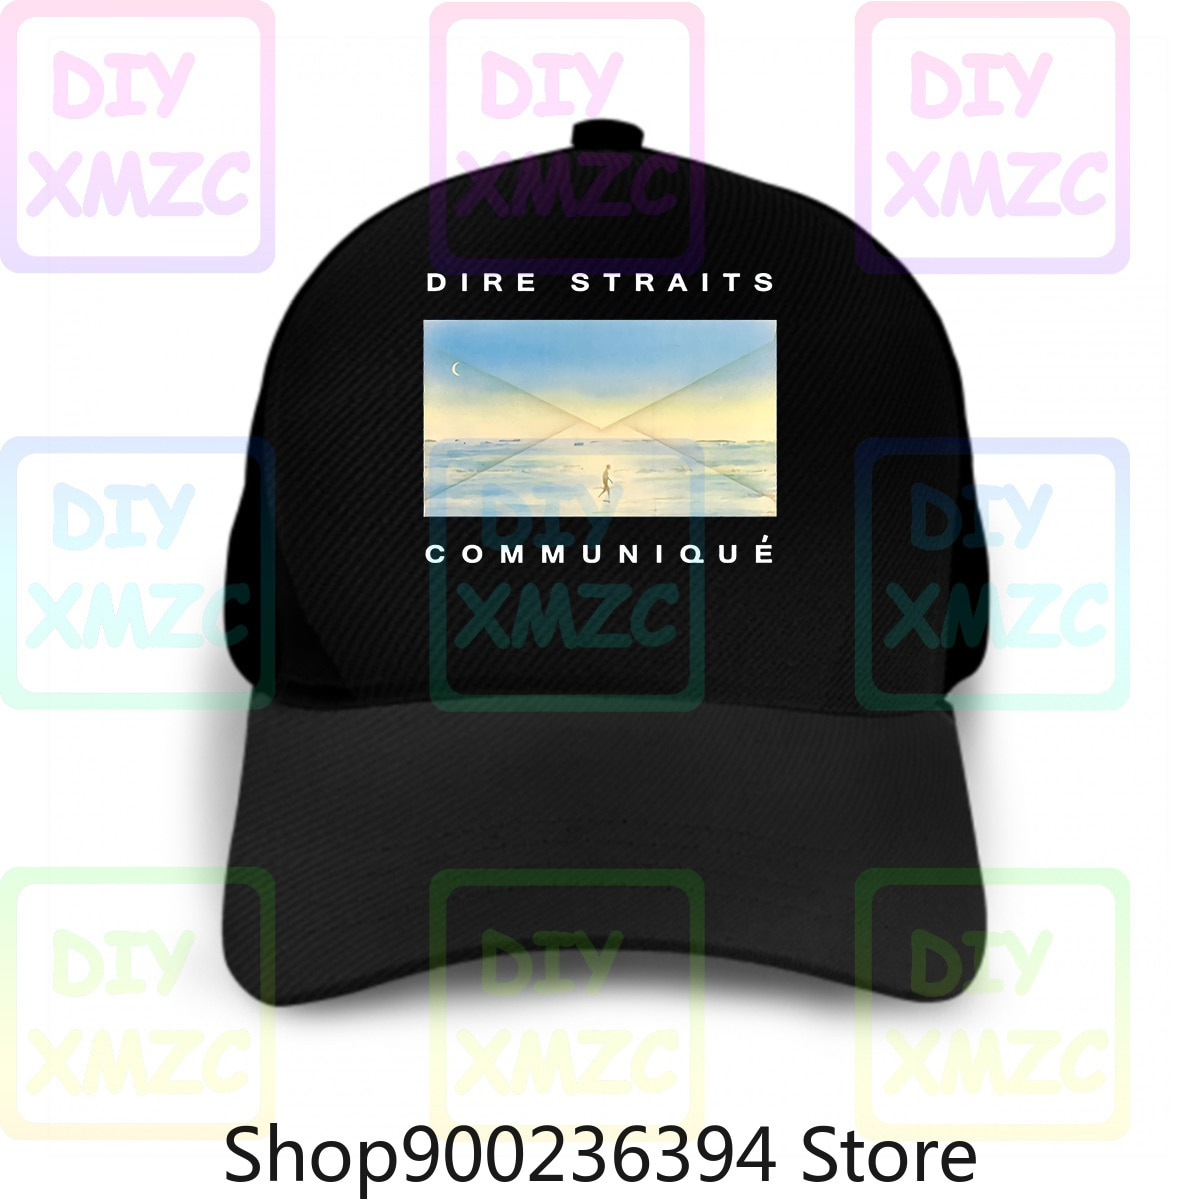 Dire straits-boné de beisebol communique chapéus poster azul todos t caga impressão chapéus c